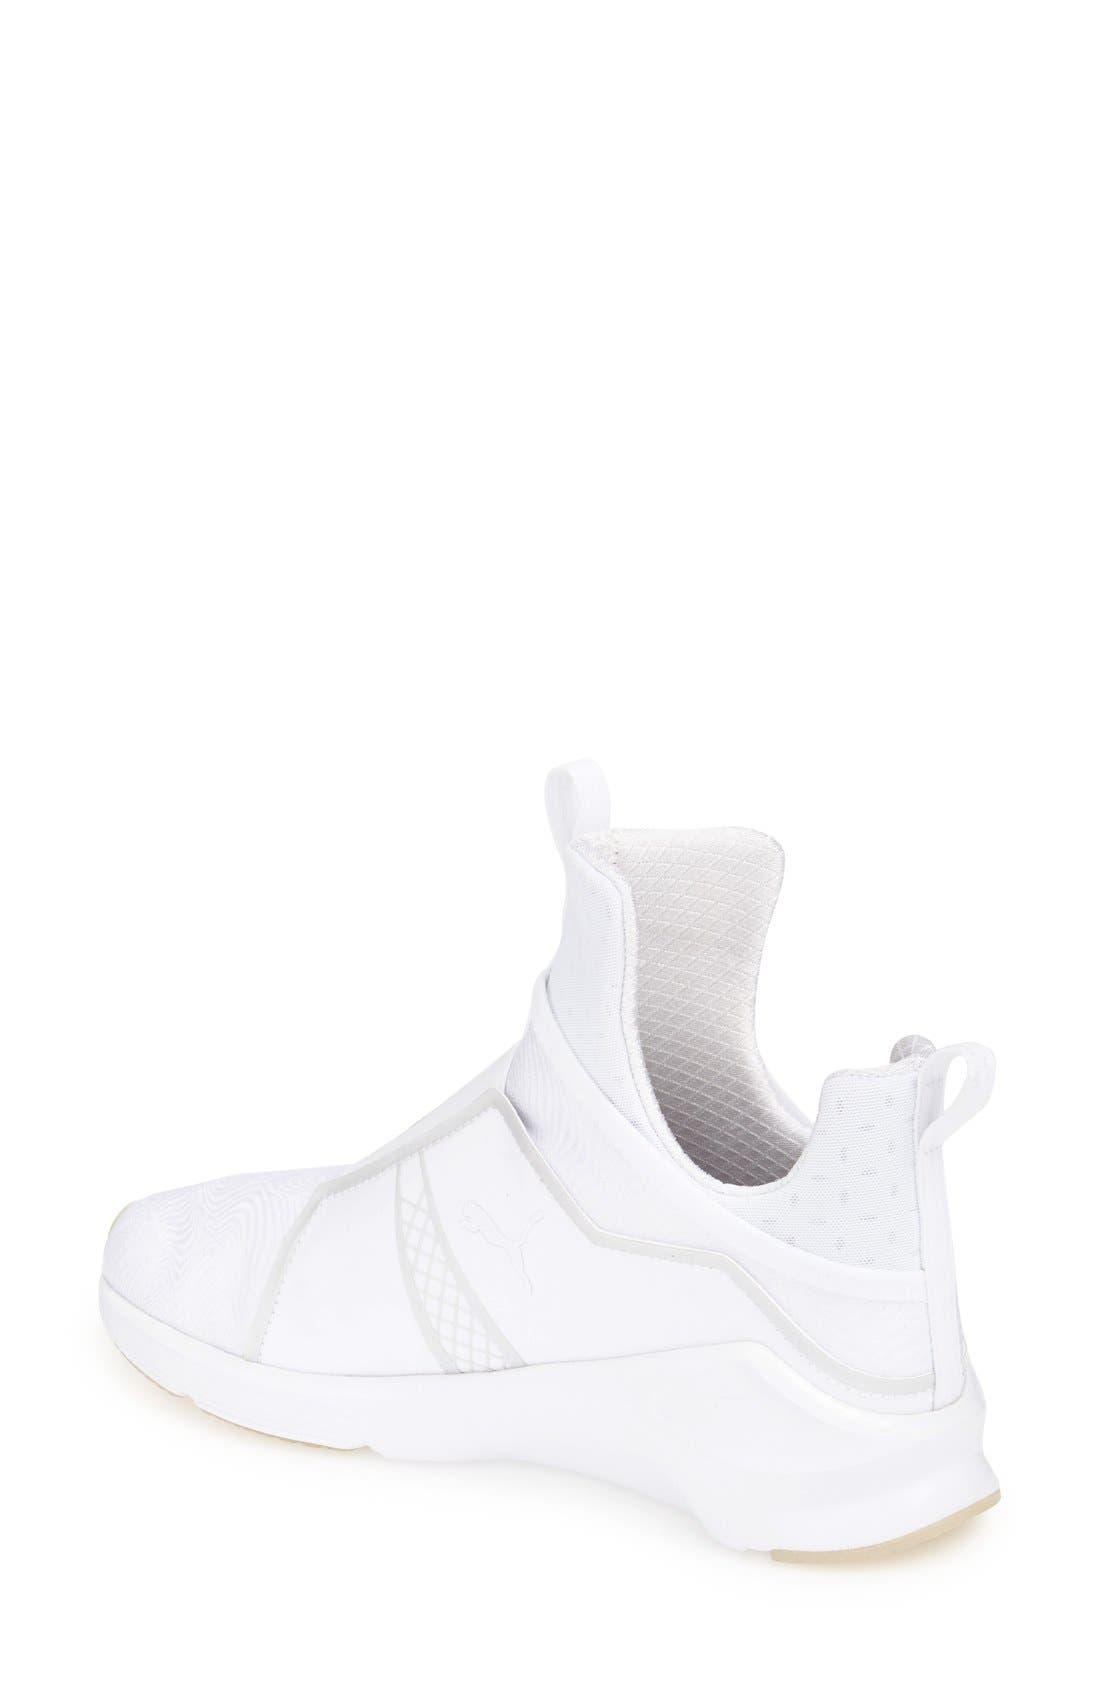 PUMA,                             'Fierce Bright' Sneaker,                             Alternate thumbnail 2, color,                             100